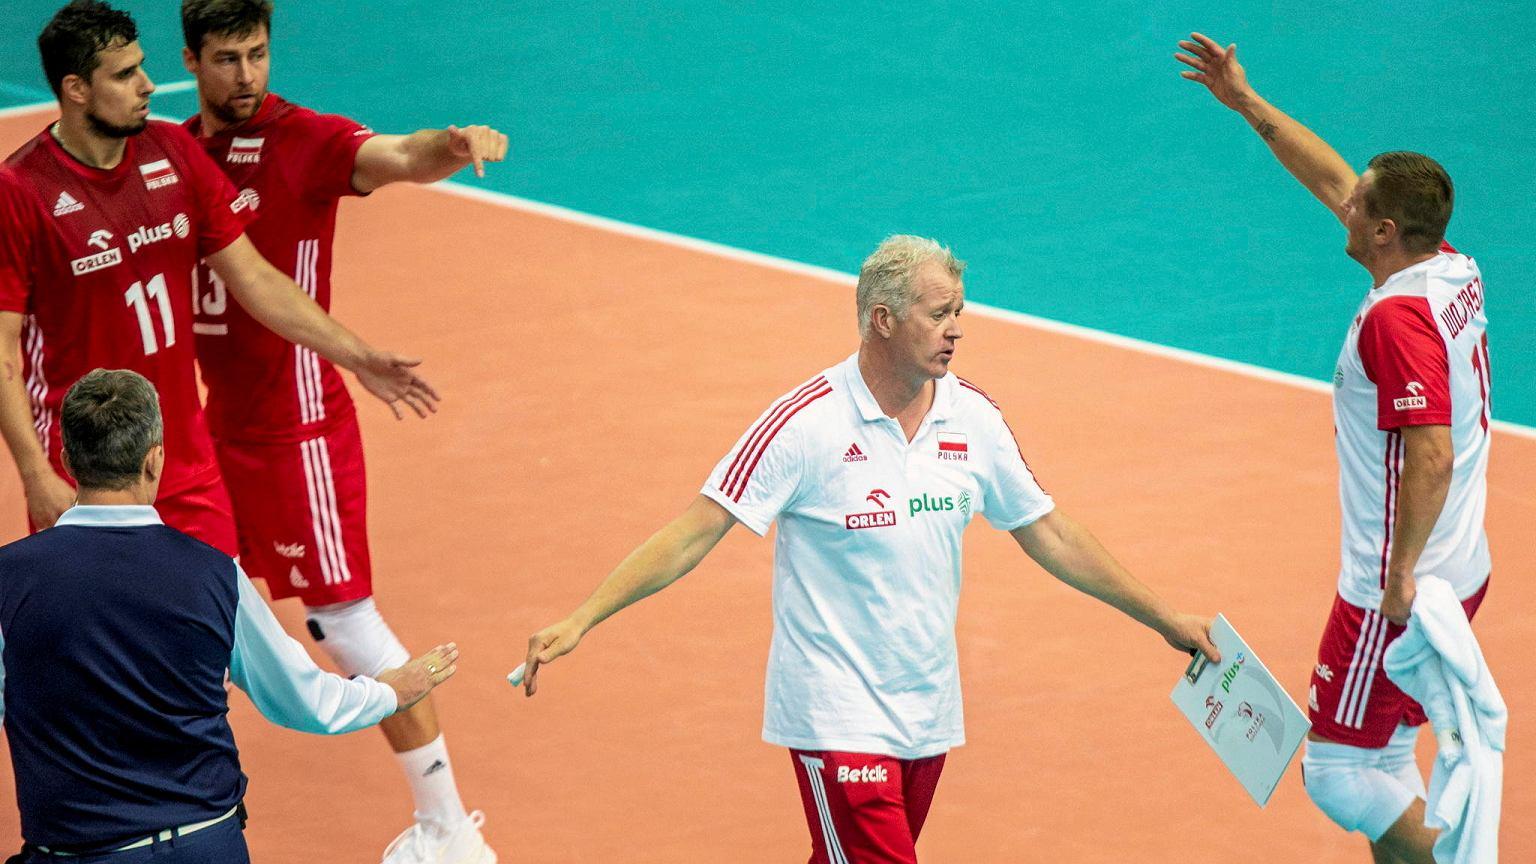 Vital Heinen says goodbye to the Polish national team